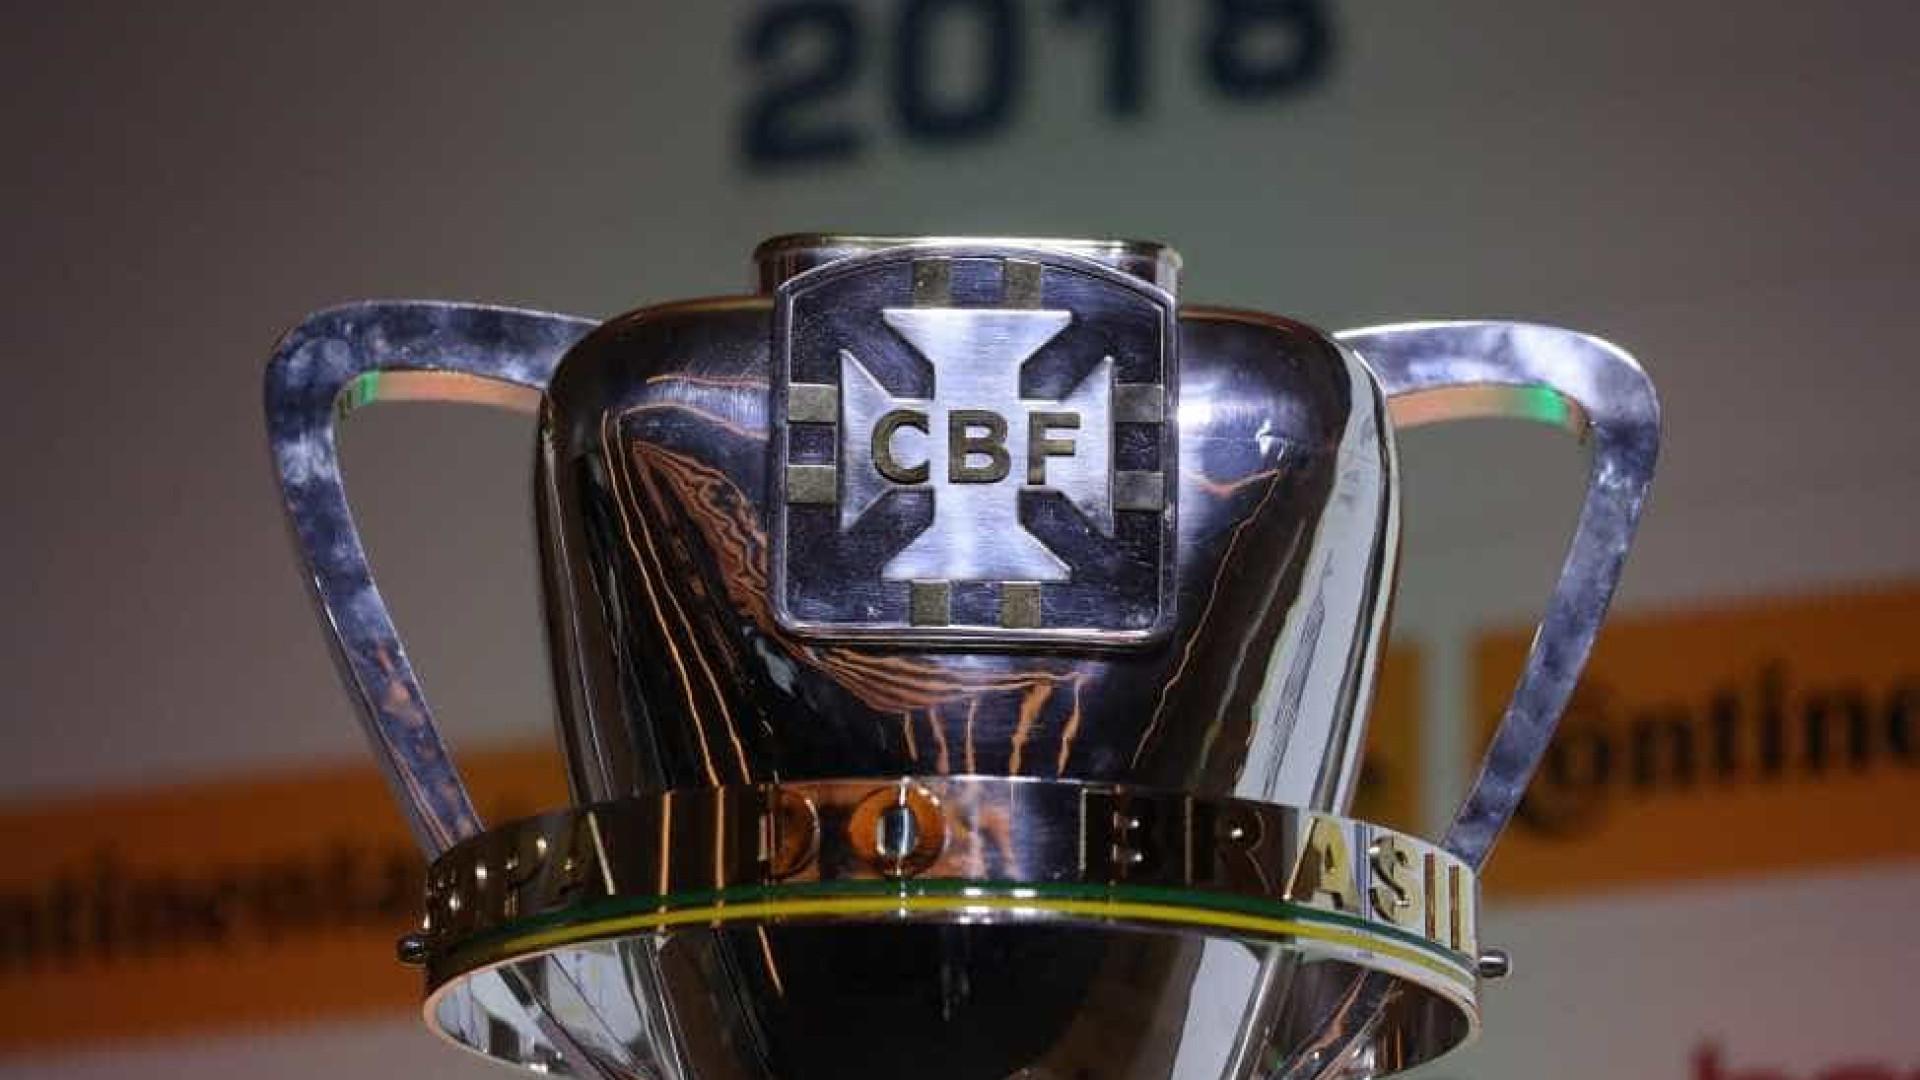 CBF marca data do sorteio da quarta fase da Copa do Brasil